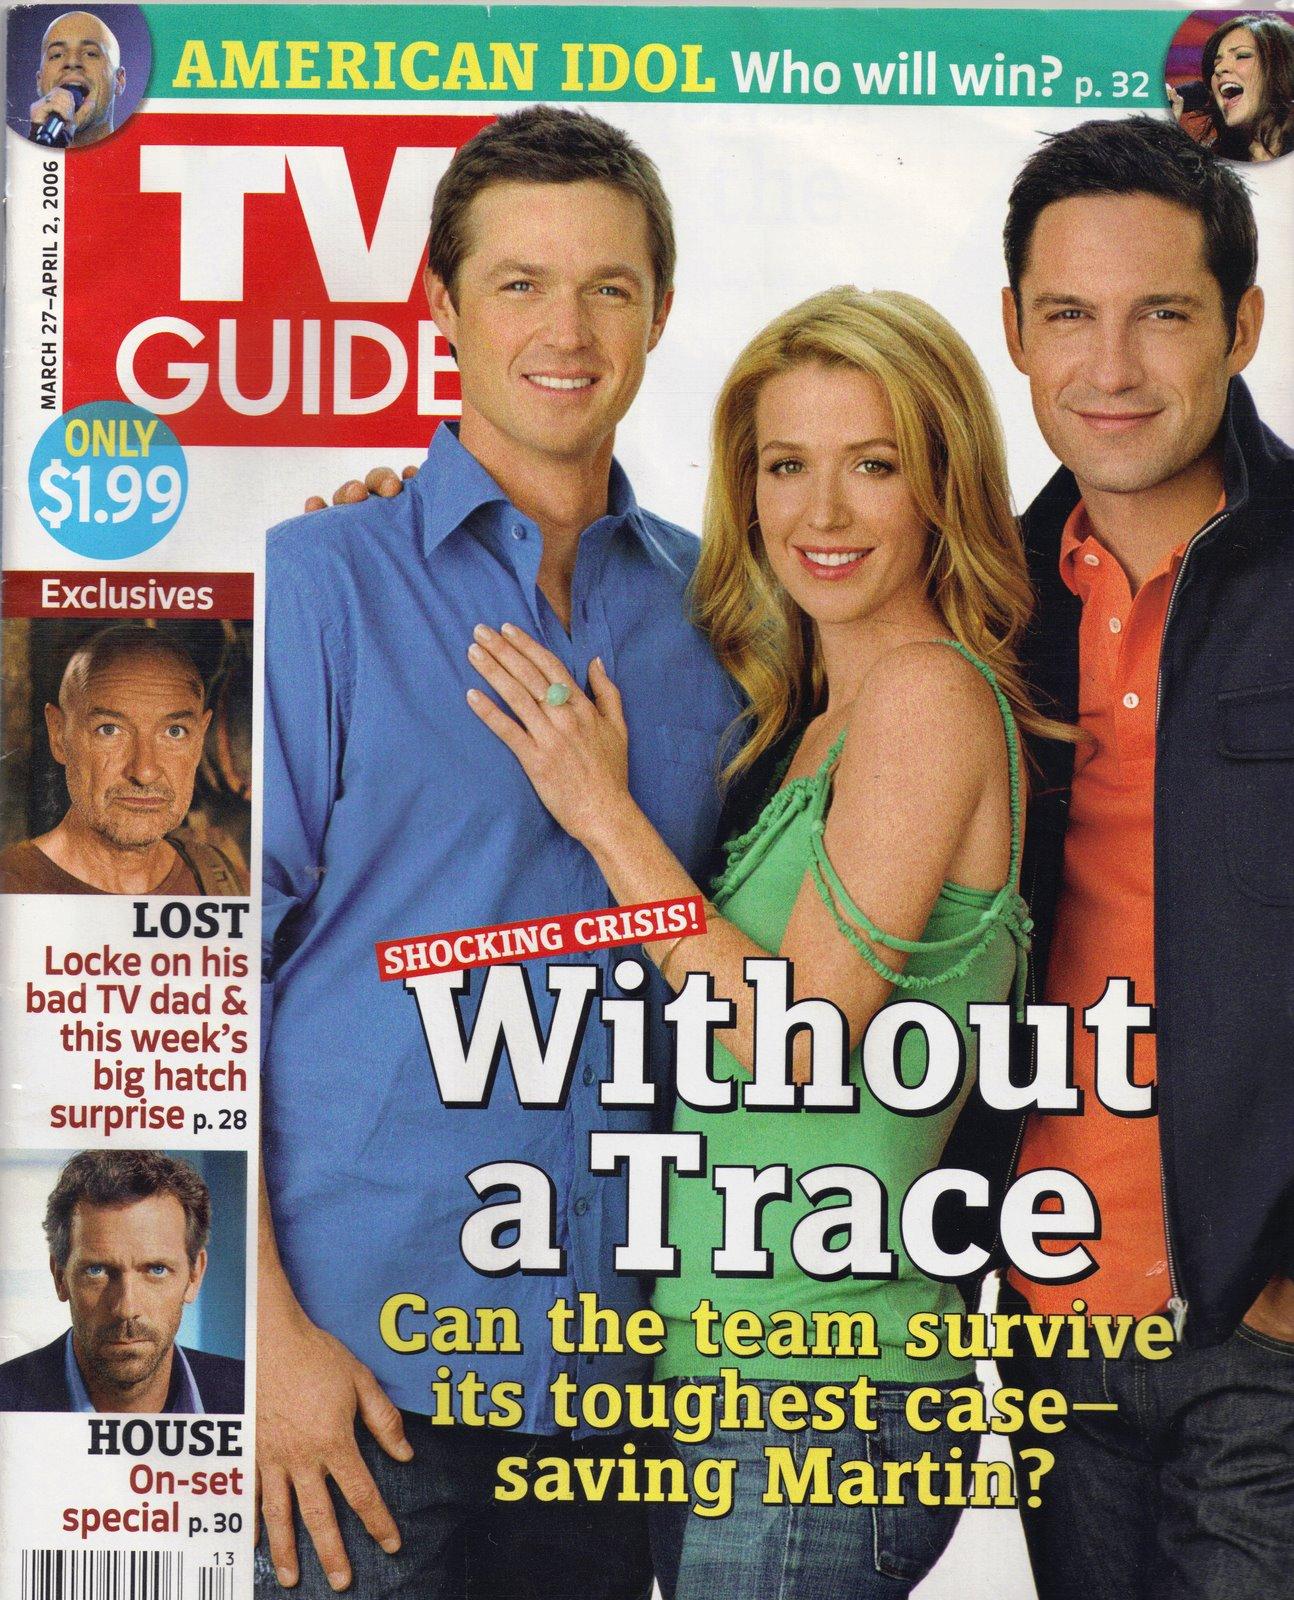 Tv Guide February 22, 1997 Chuck Norris Texas Ranger Leon Uris COVER HAS CREASES